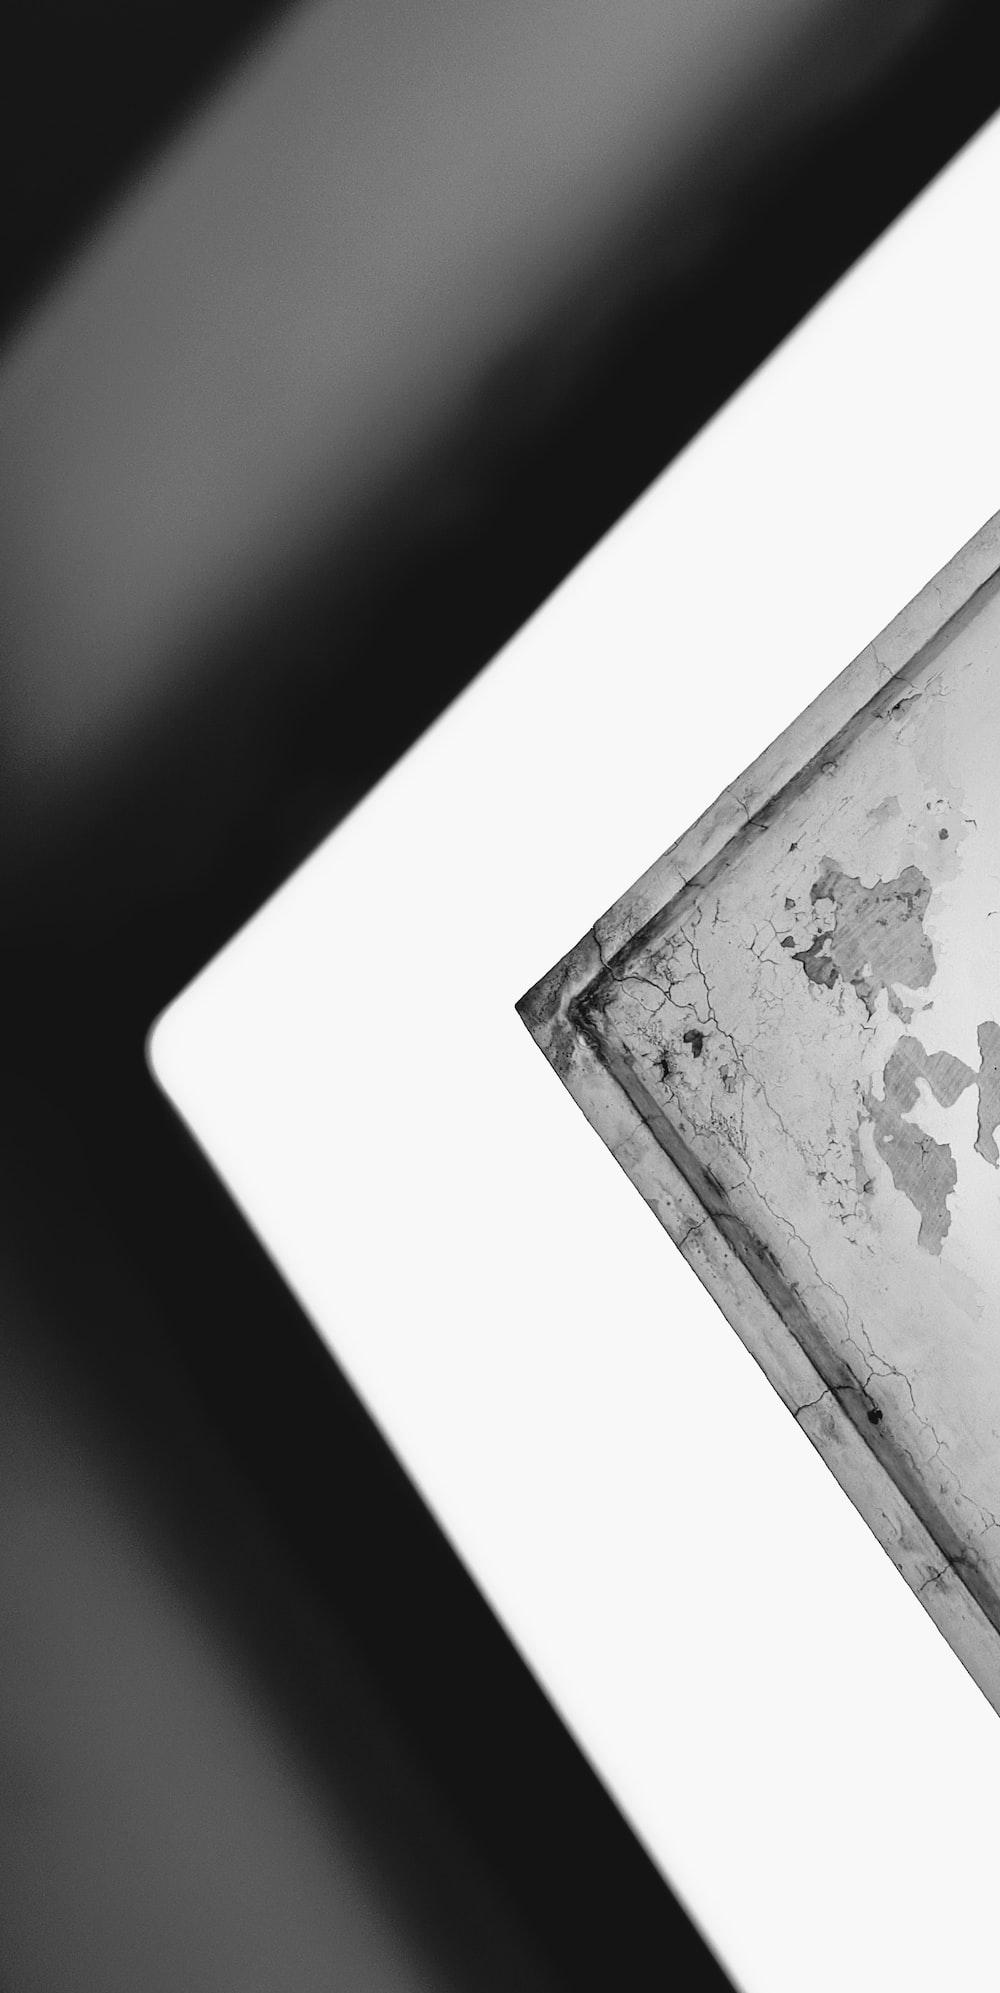 white photo frame on black surface